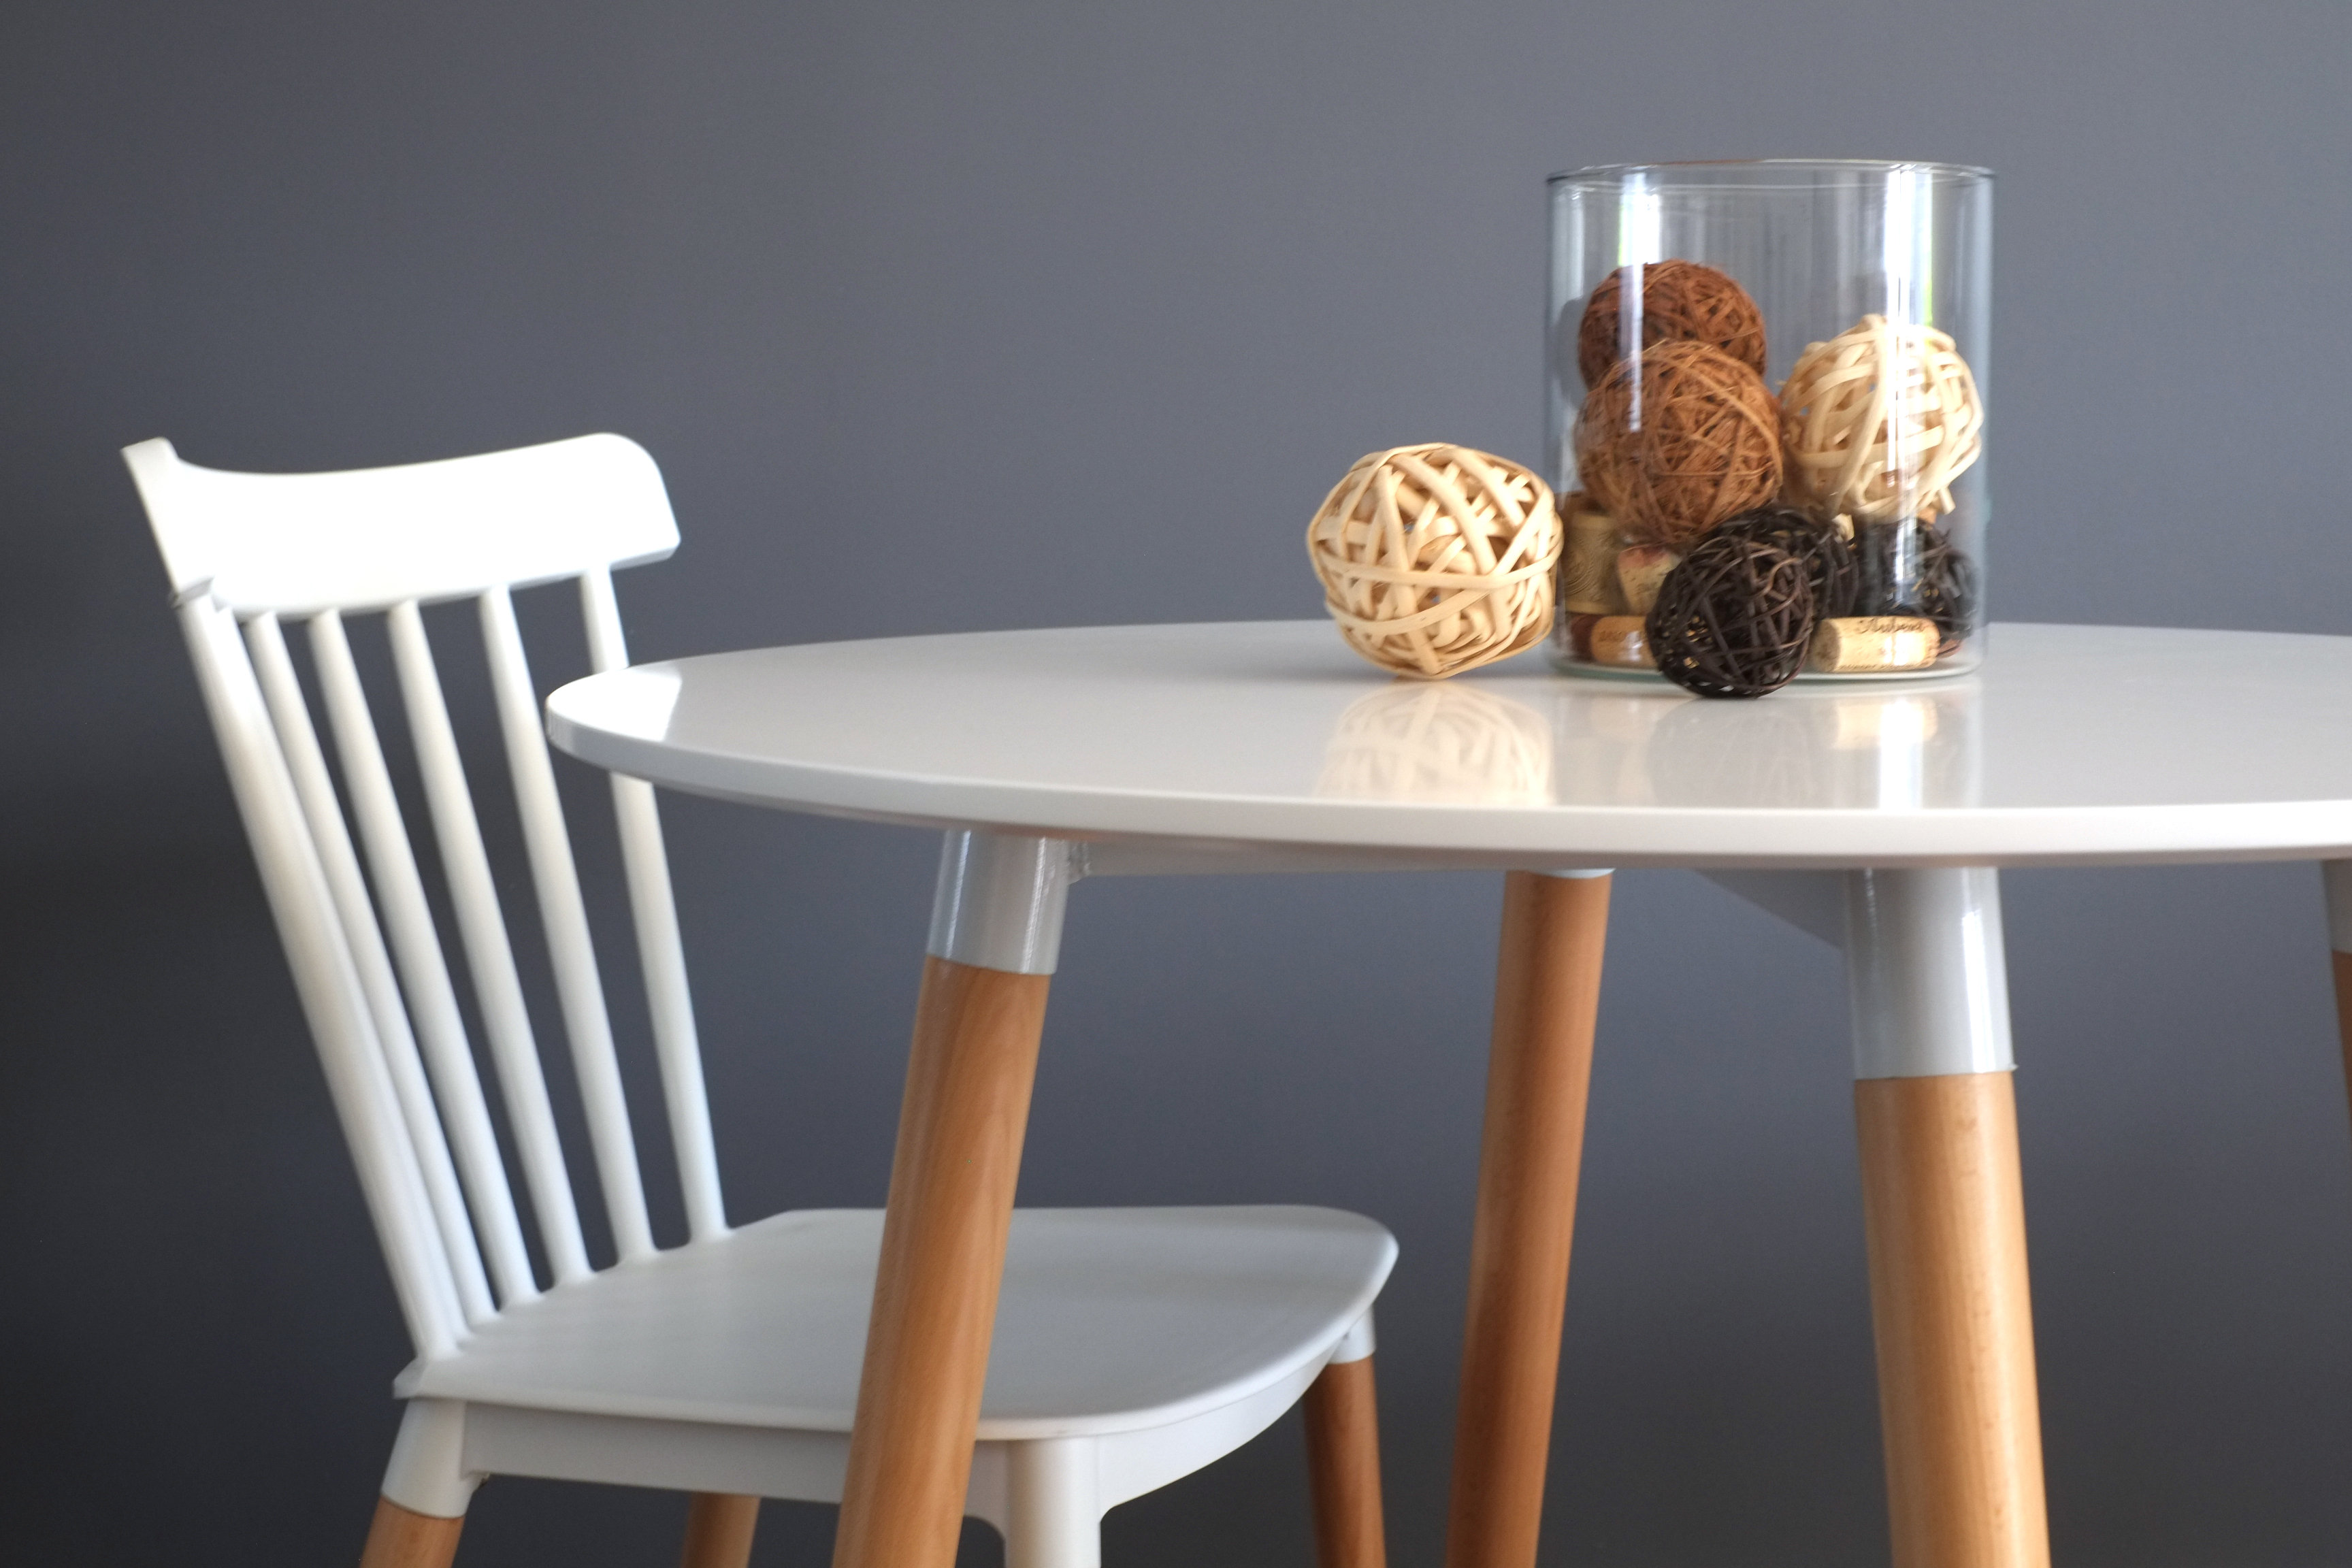 Inspirer Studio 4 Legs Kitchen Dining Table White Round Coffee